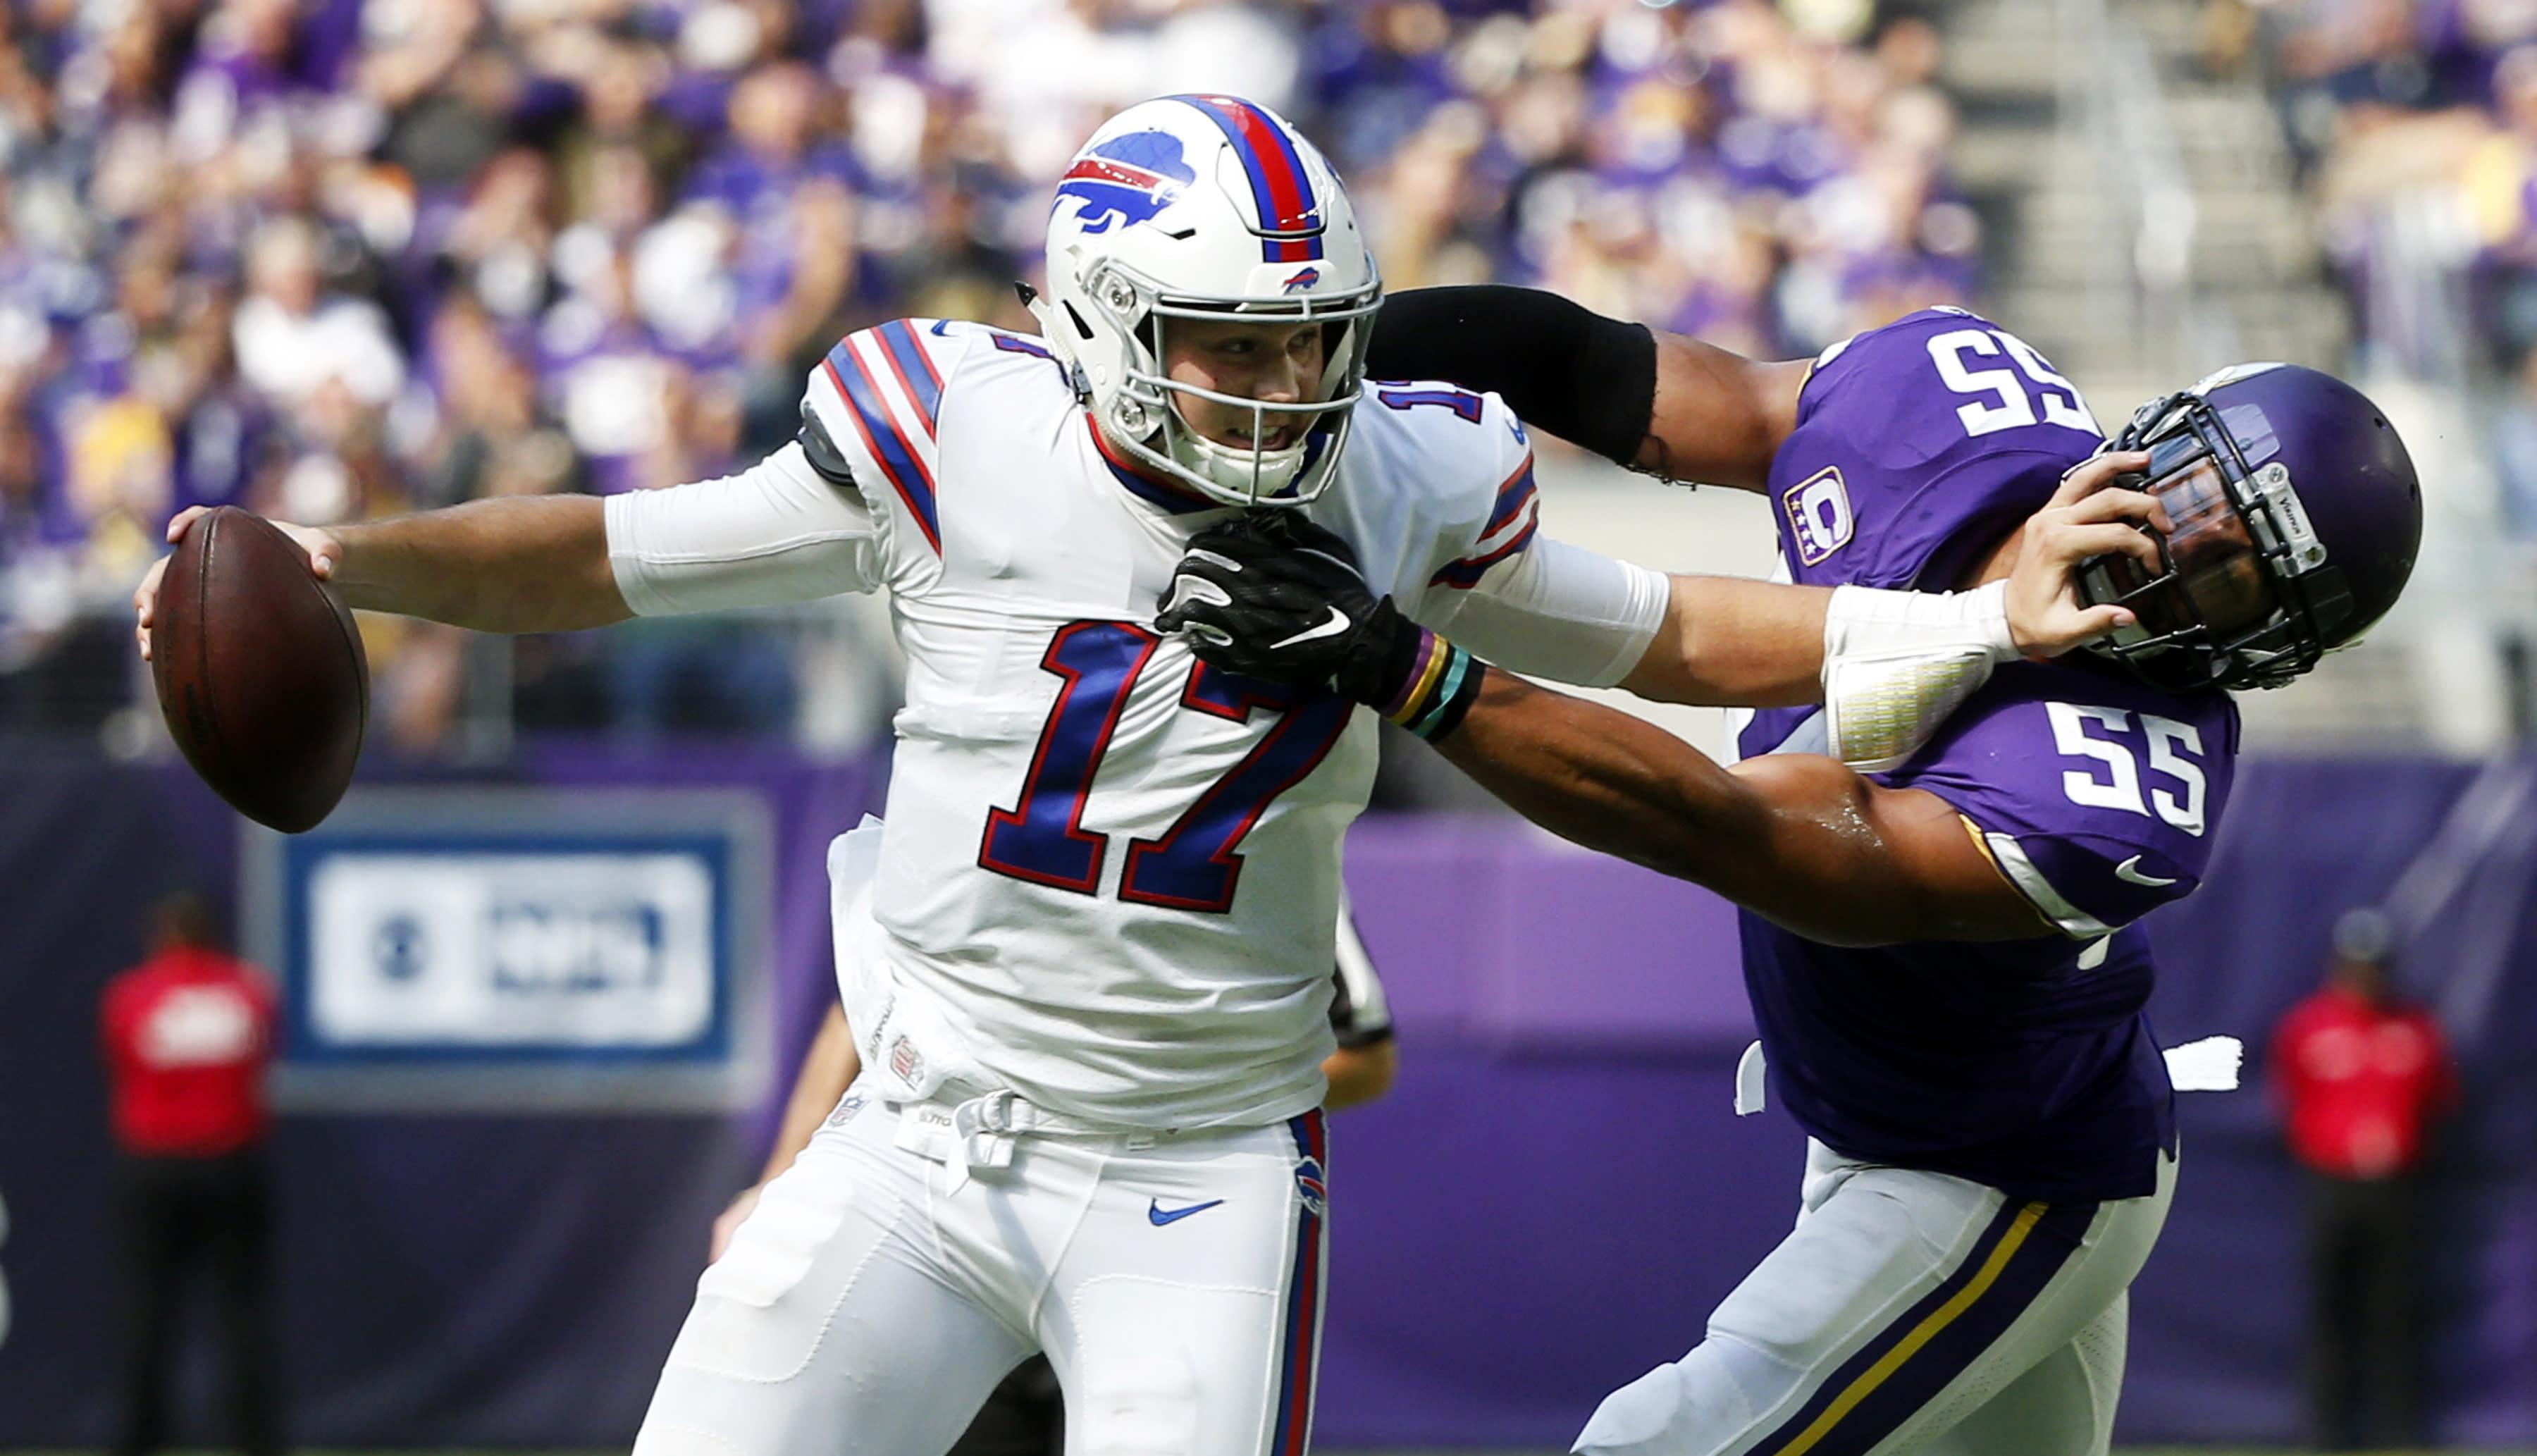 Bills' win over Vikings is largest NFL upset since 1992, wrecks survivor pools everywhere